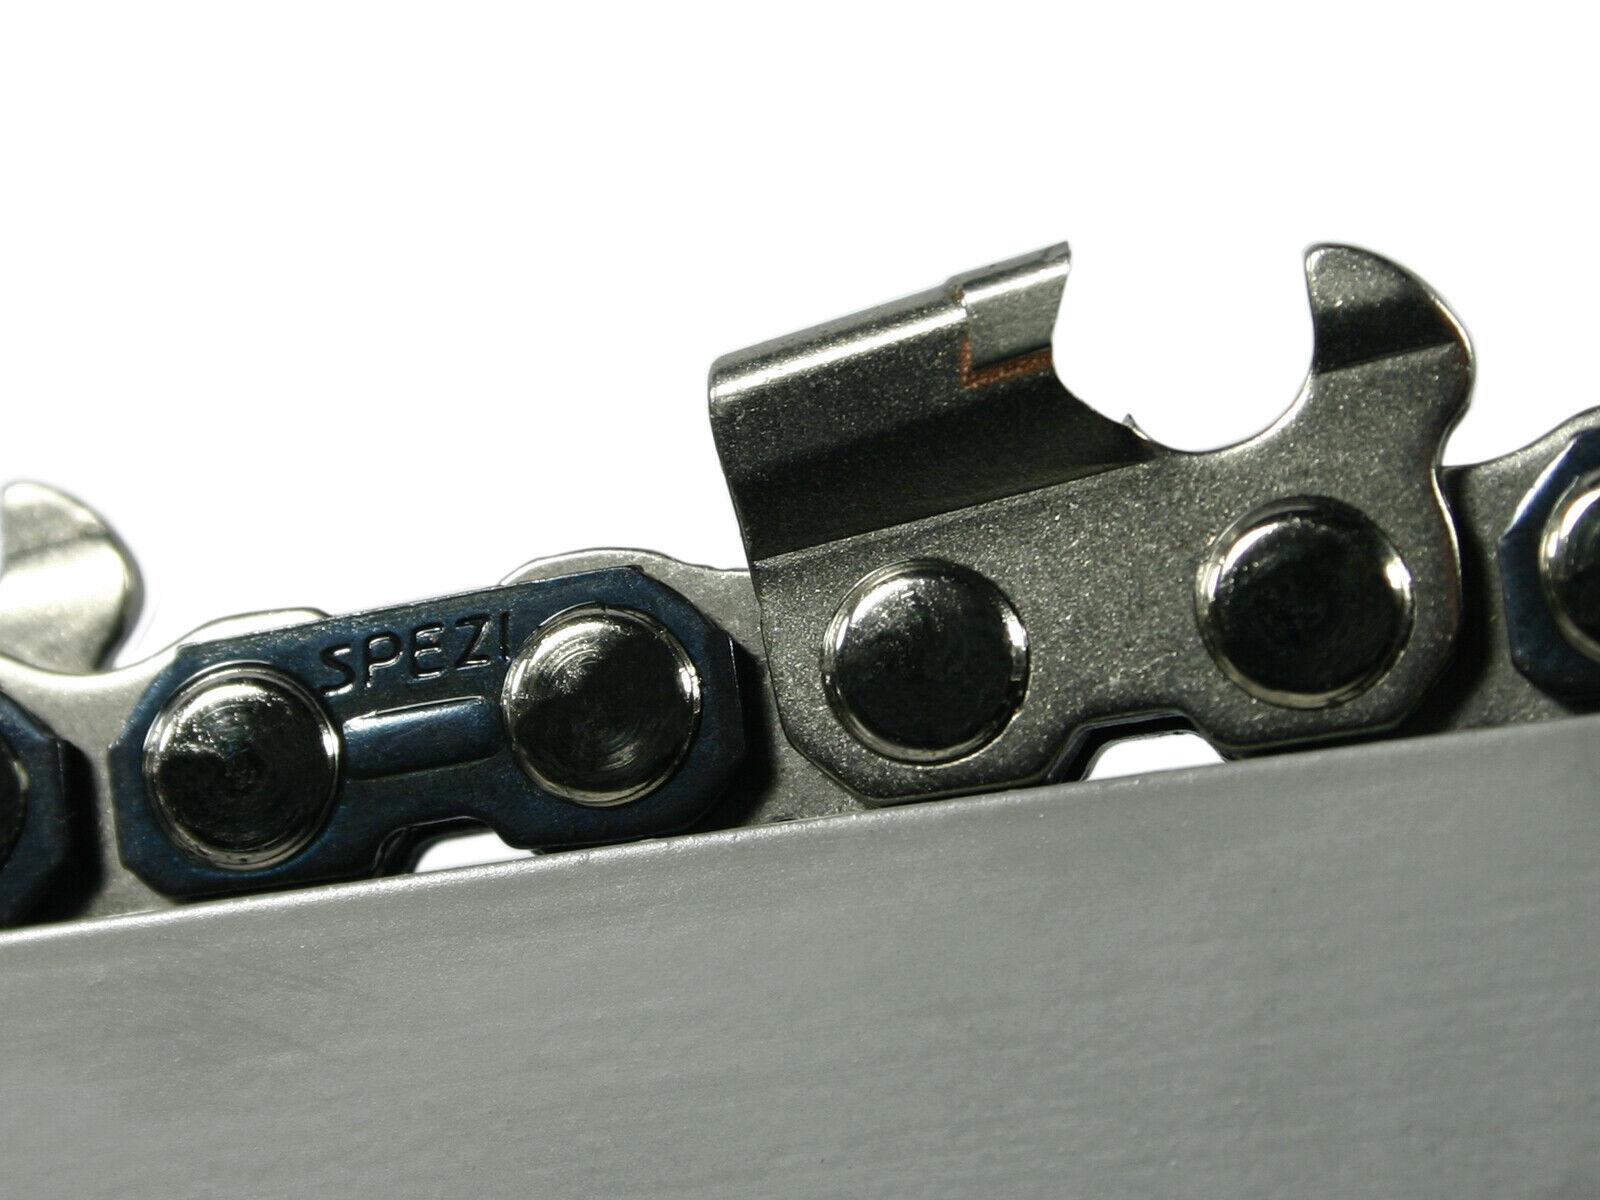 Metal duro cadena sierra adecuado para dolmar ps7300 70 cm 3 8  92 TG 1,5 mm Cochebide